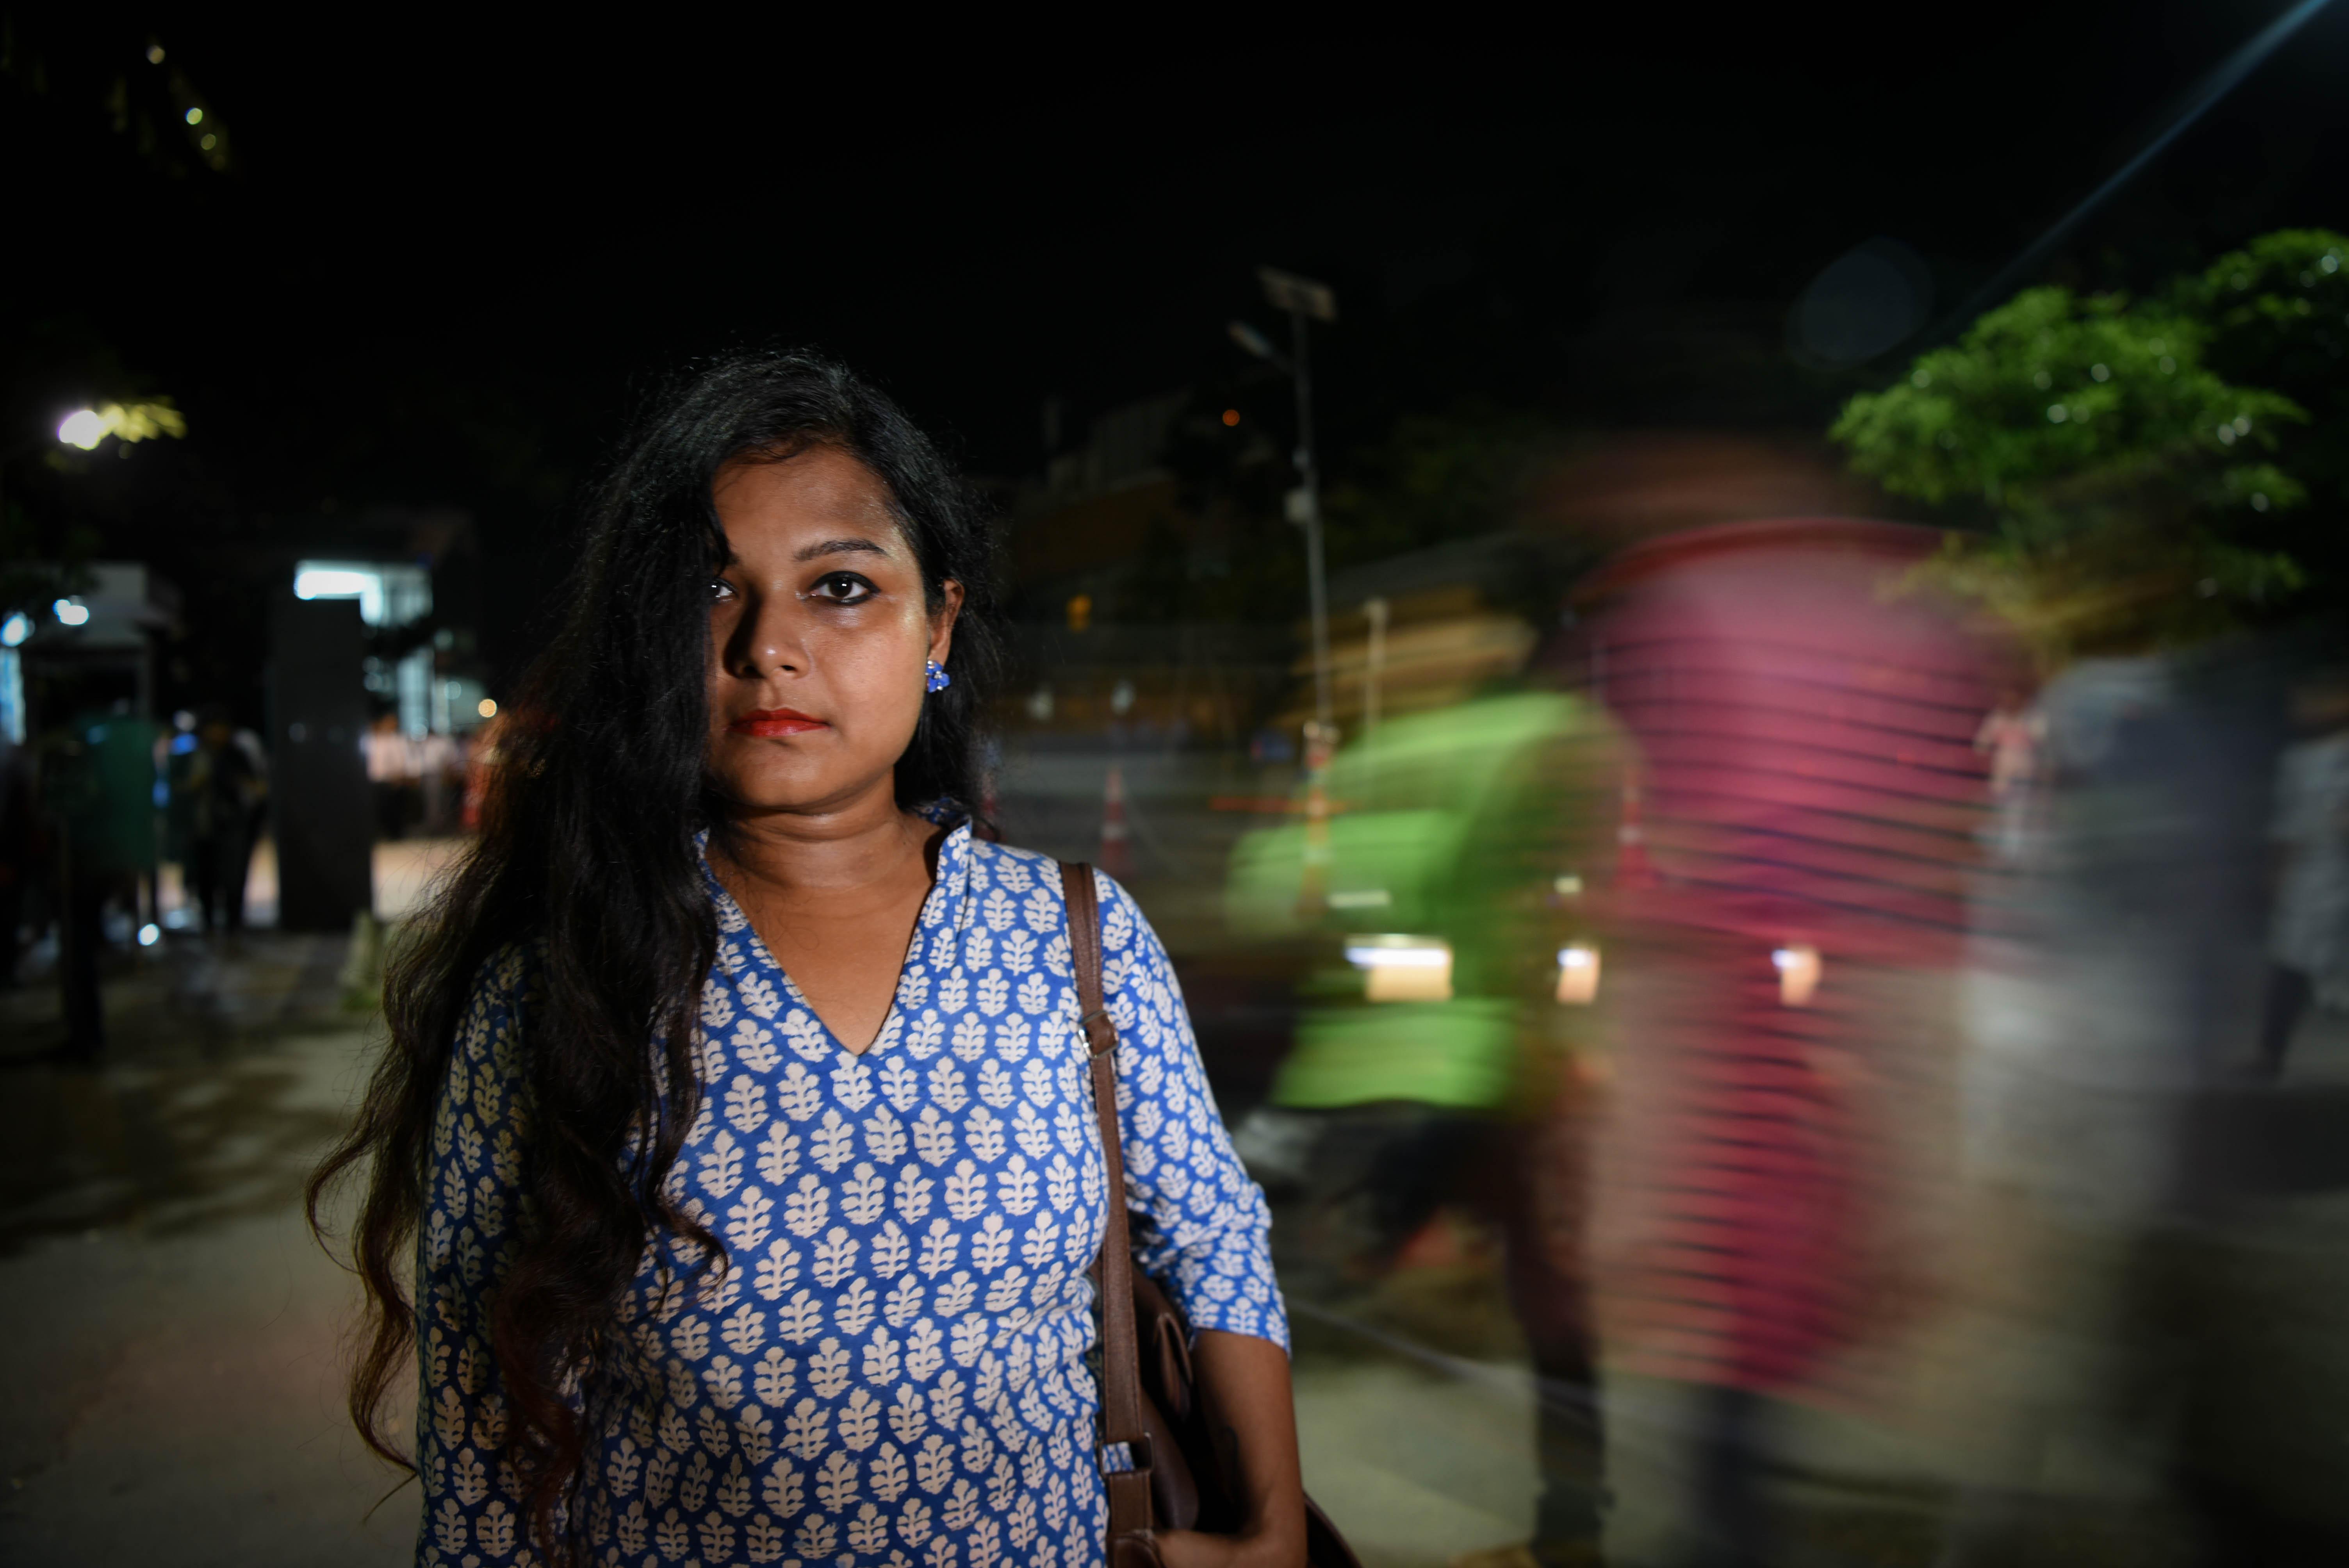 Panchali, 26 año,